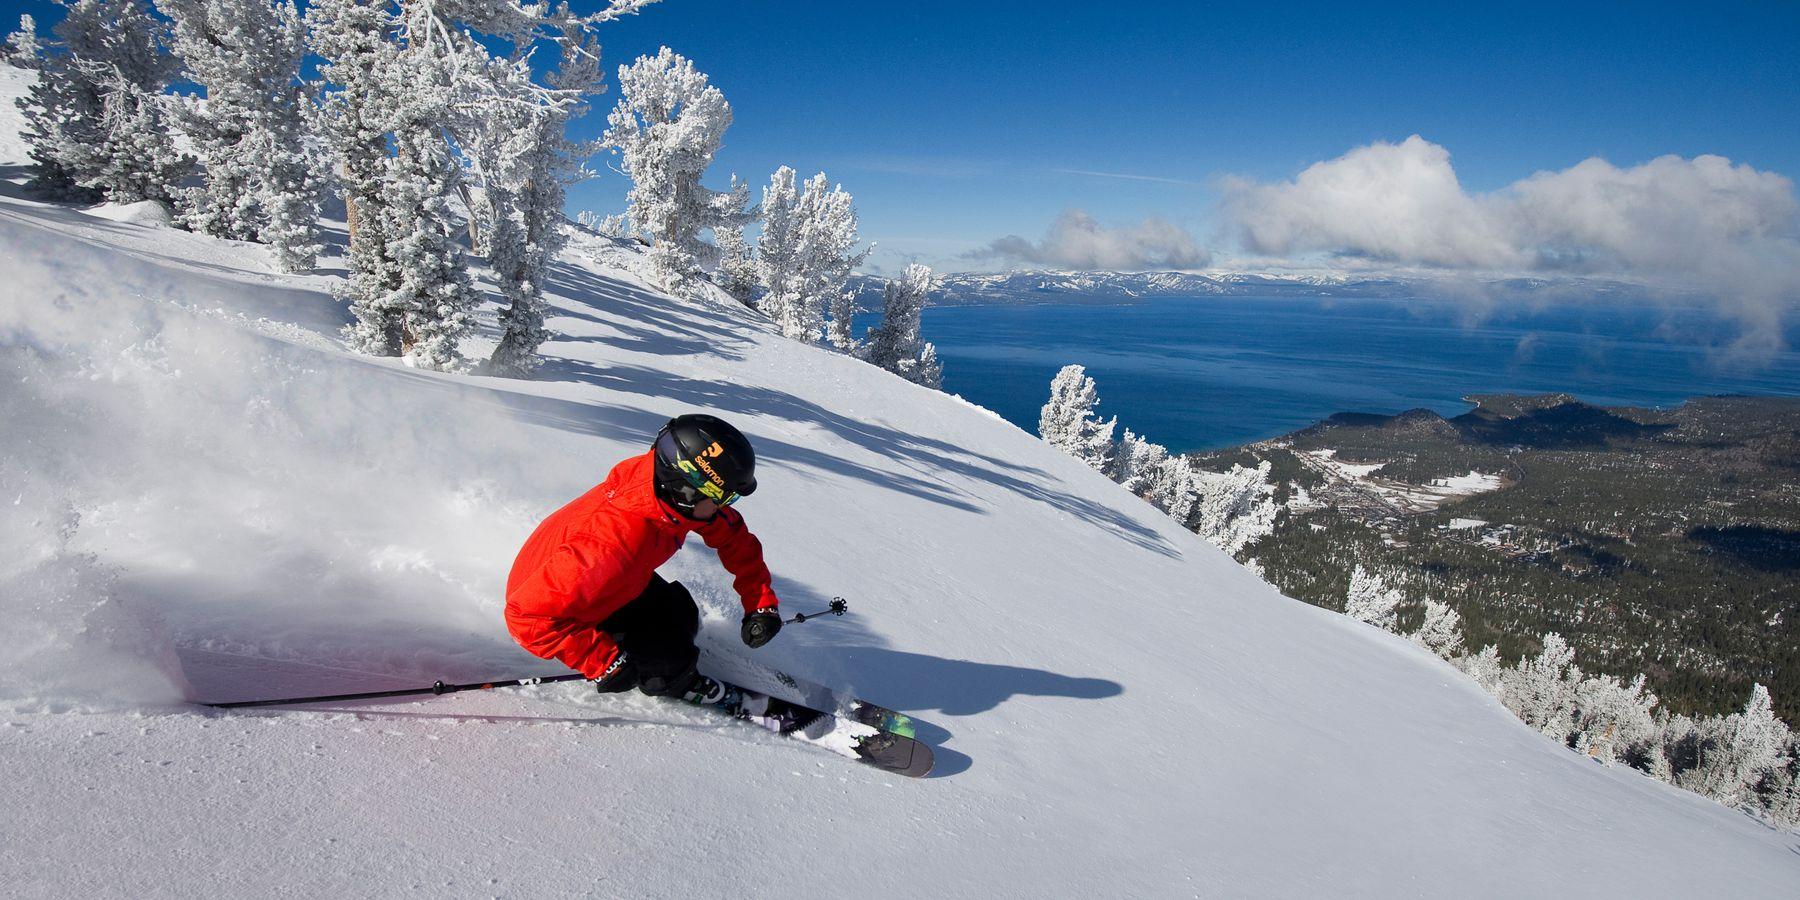 Wintersport Heavenly Lake Tahoe California USA